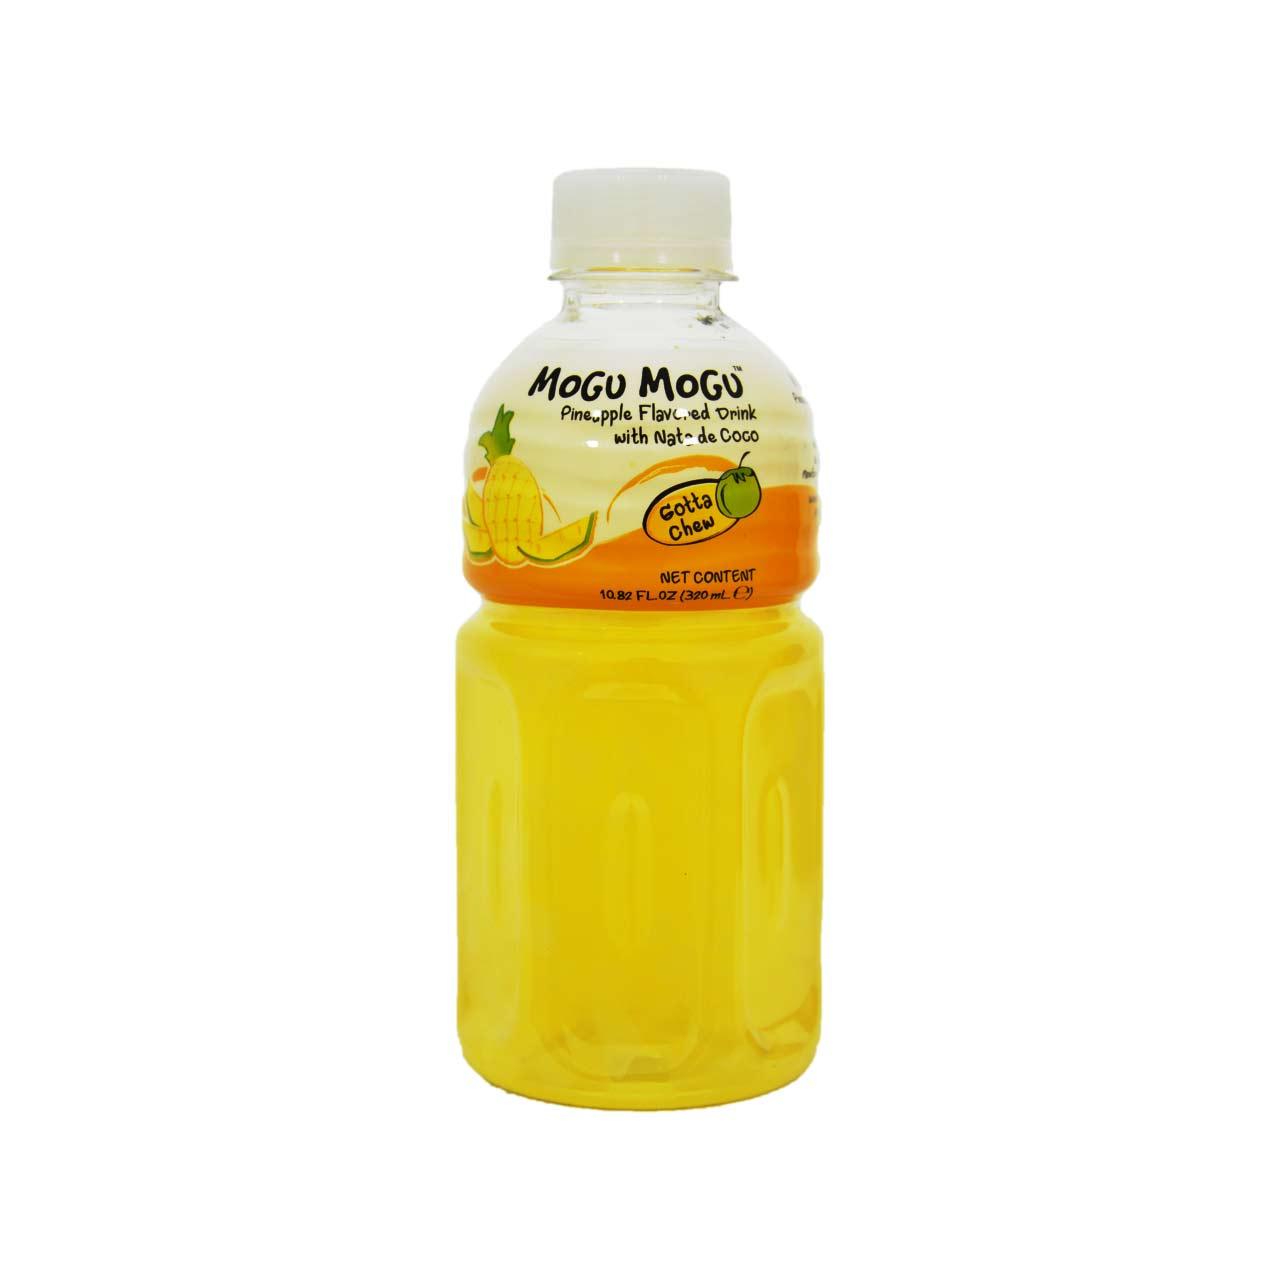 موگو موگو آناناس